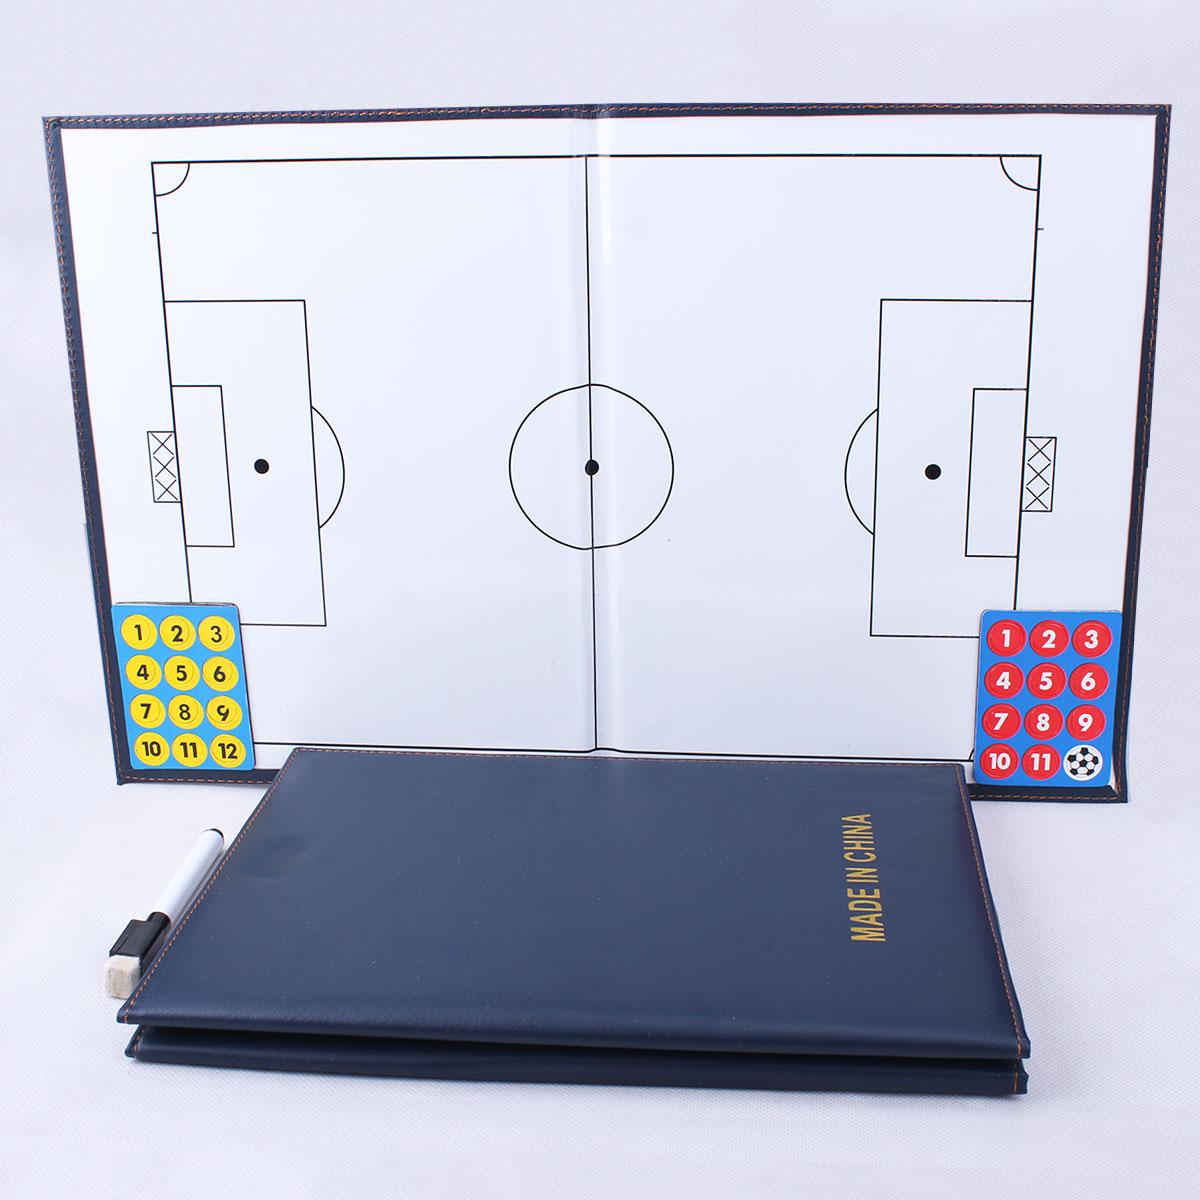 The football coach tactical board tactical disc sand table cortex tactics board / demonstration board erasable(China (Mainland))